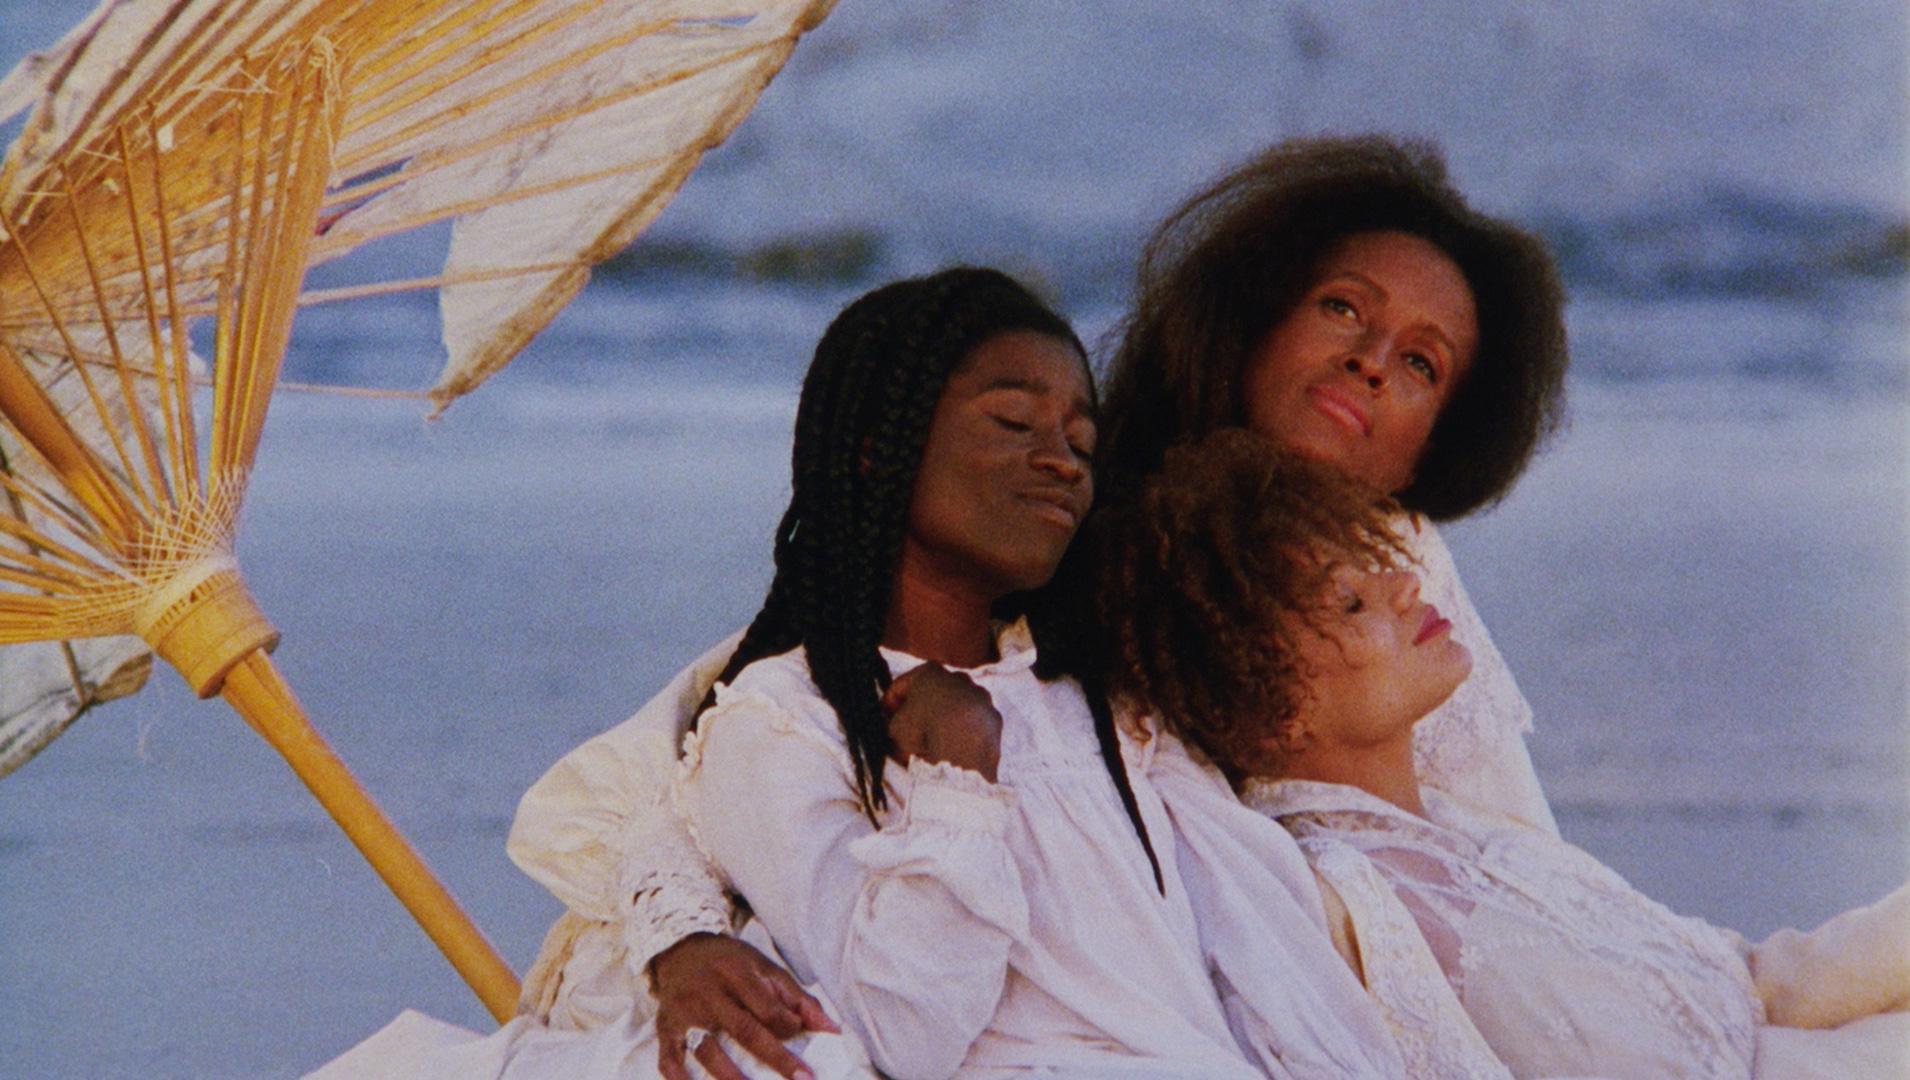 Daughters of the Dust (1991) dir. Julie Dash